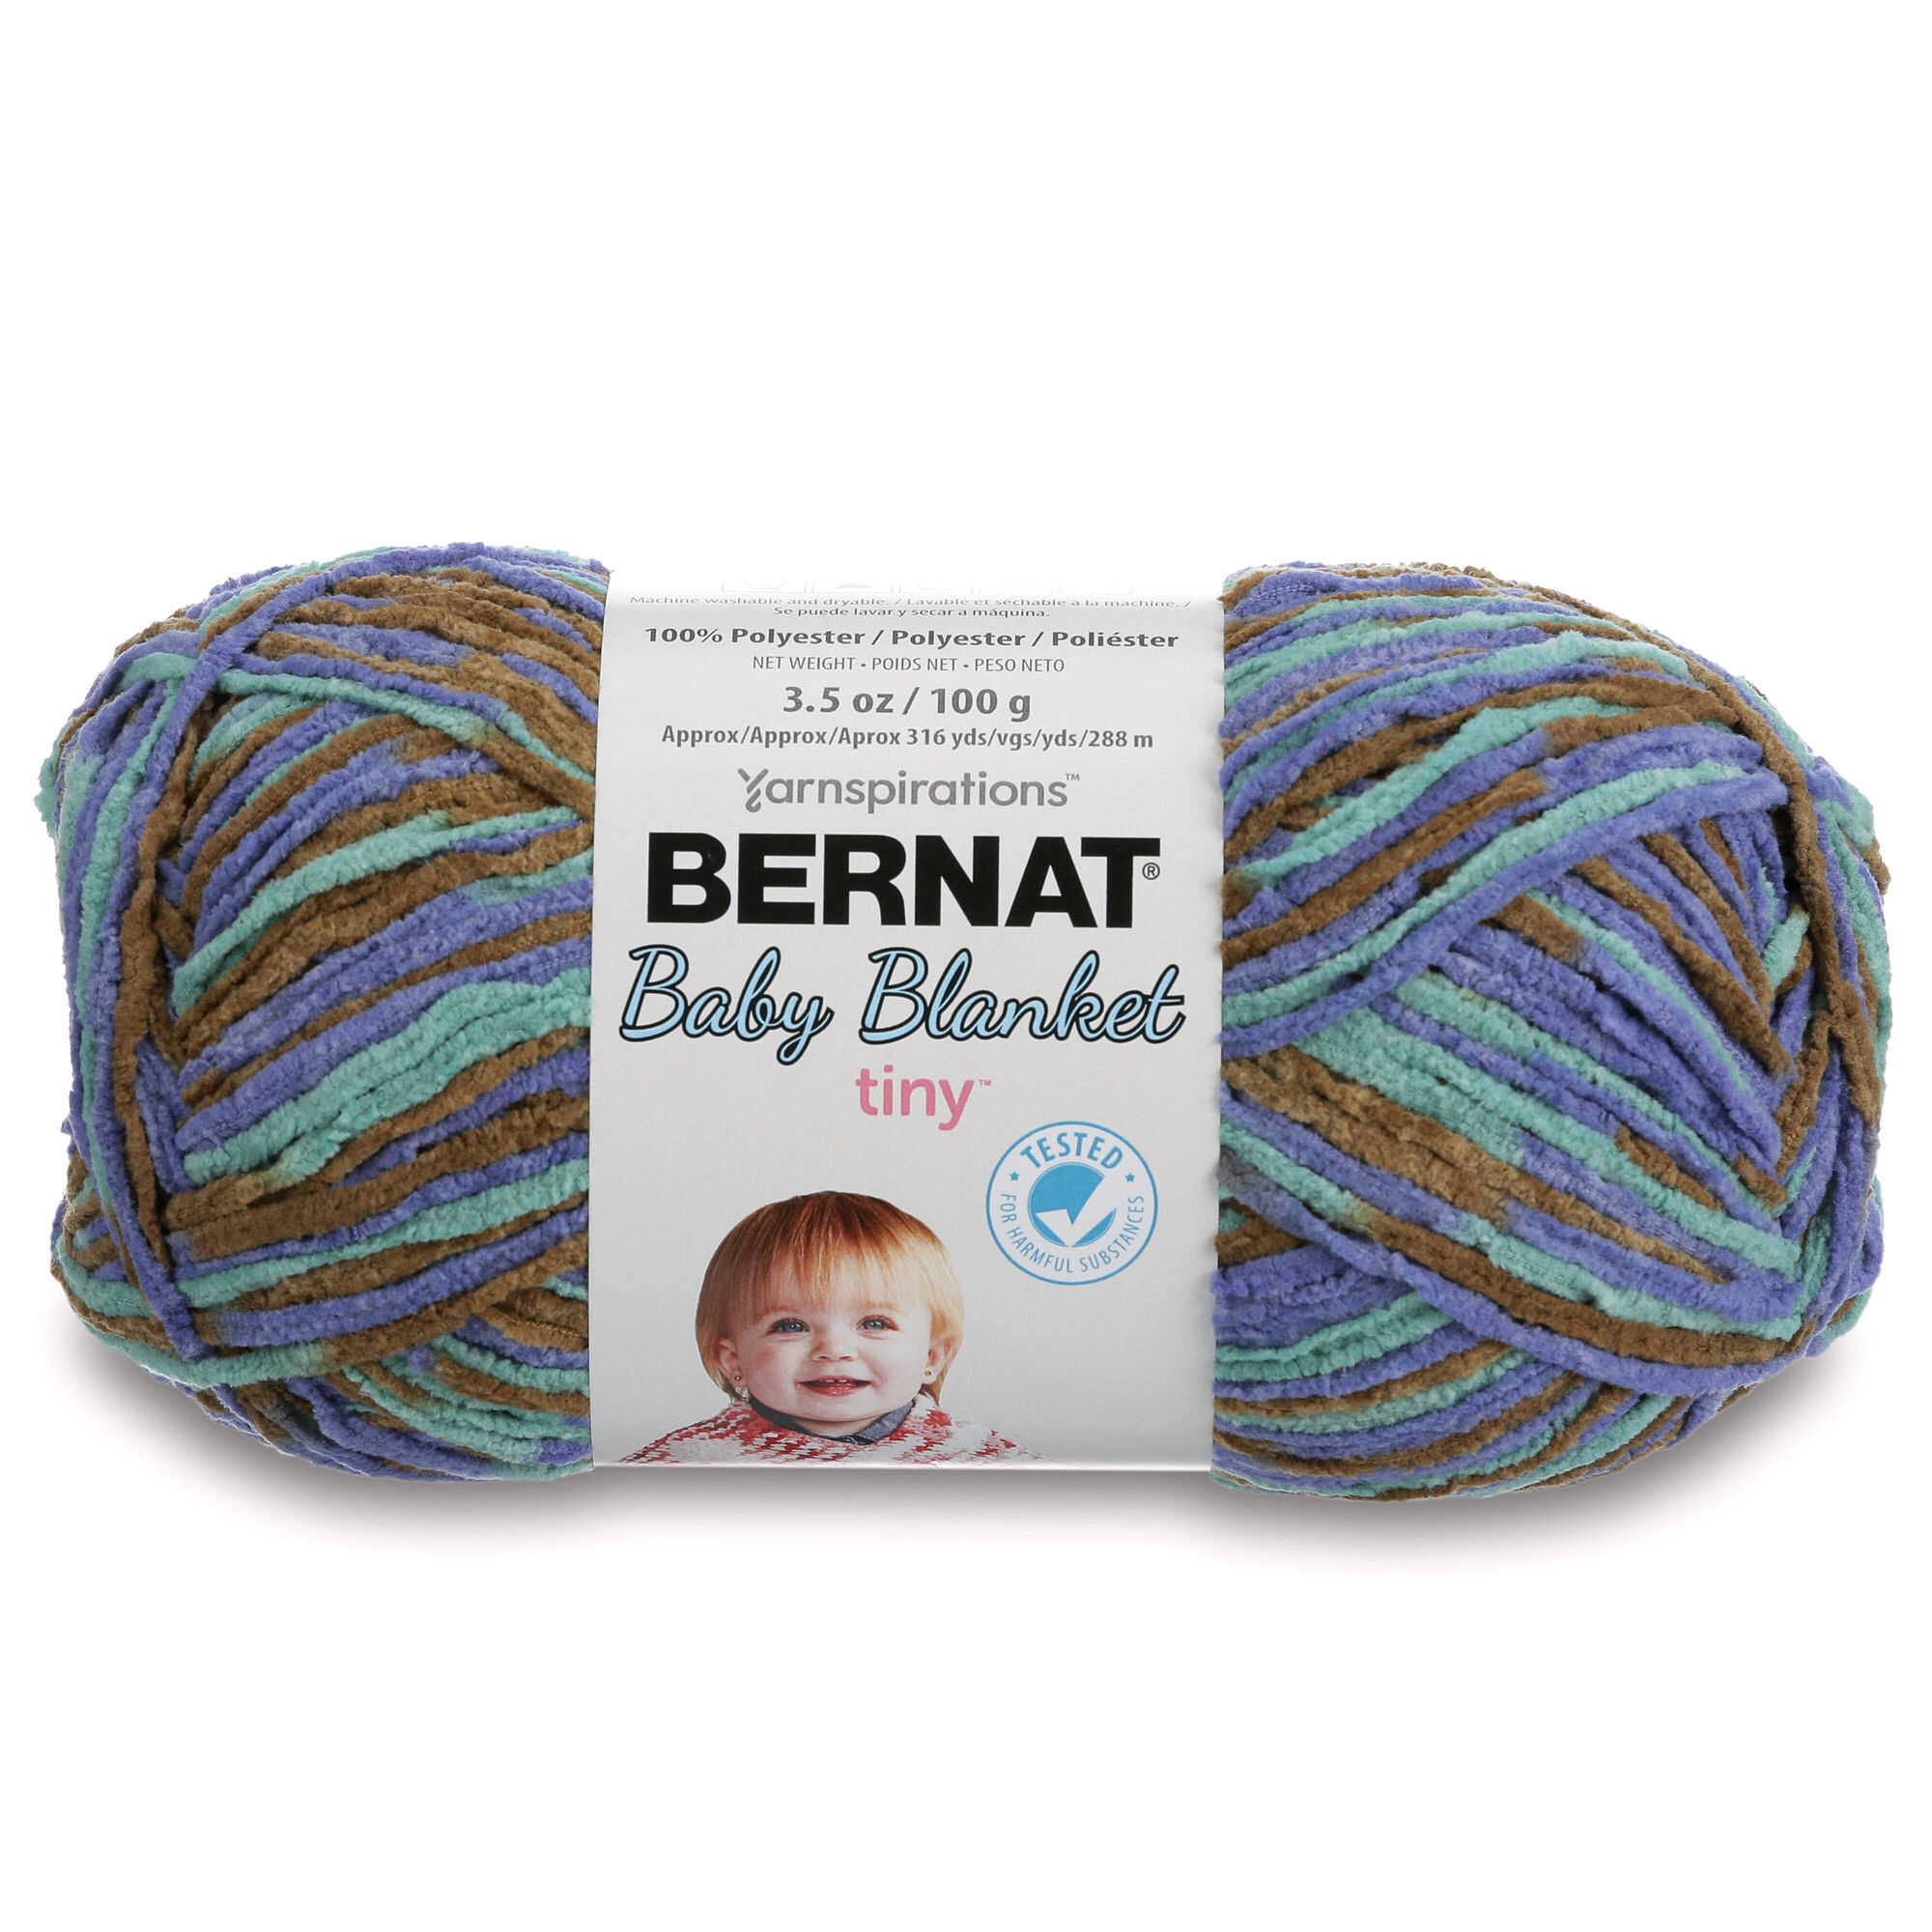 Bernat Baby Blanket Tiny Yarn-wishing Well